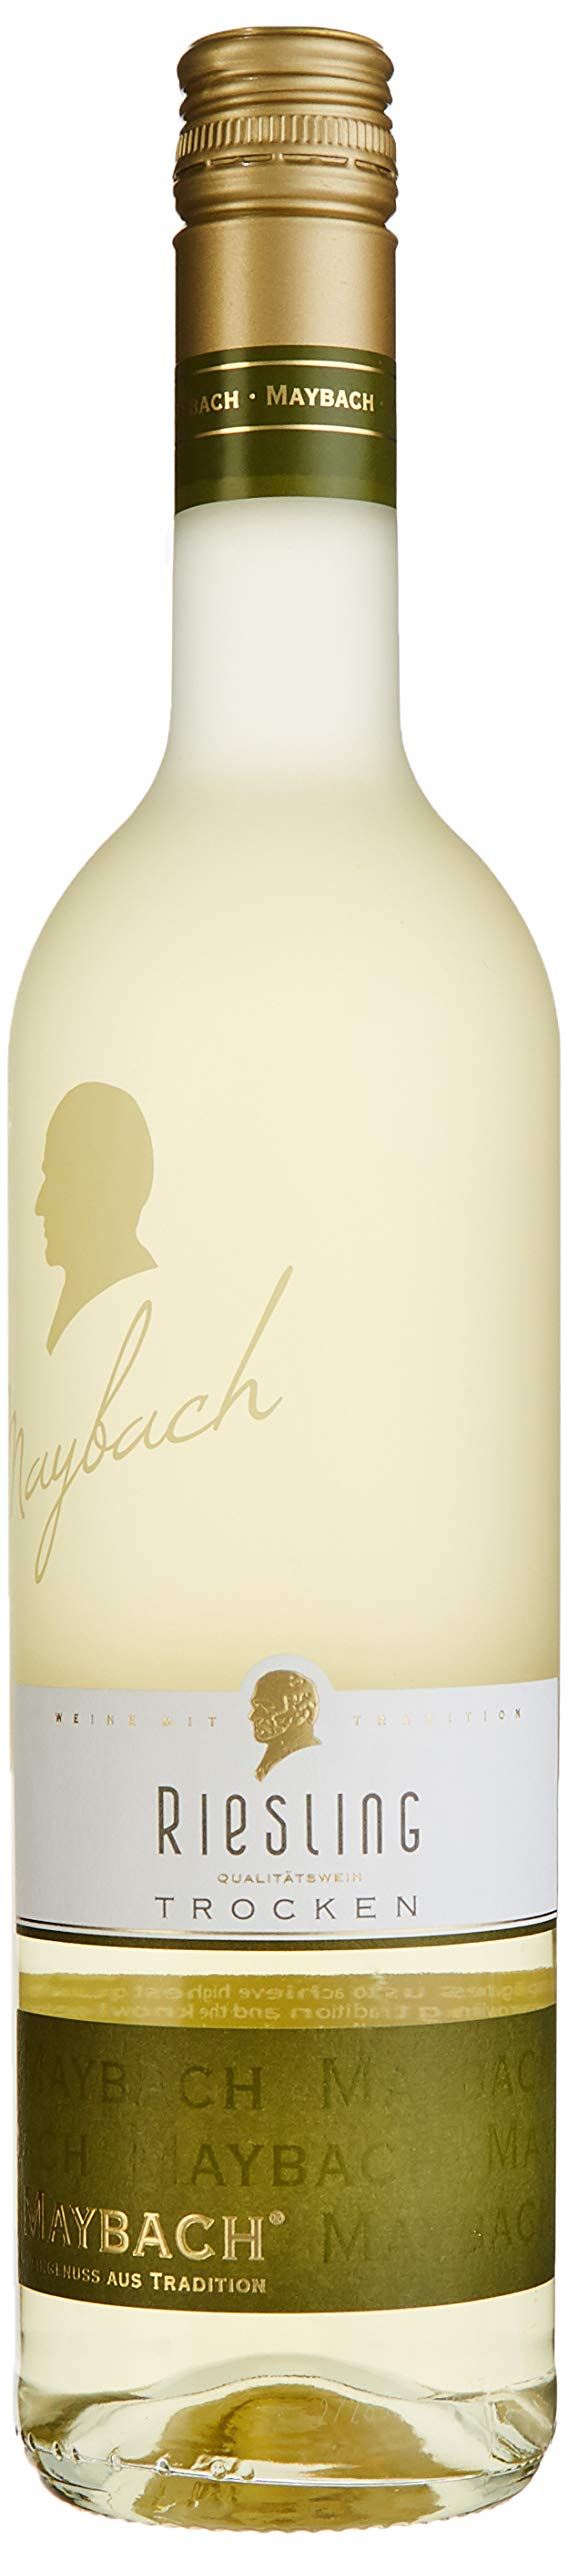 Maybach-Qualittswein-Riesling-trocken-6-x-075-l